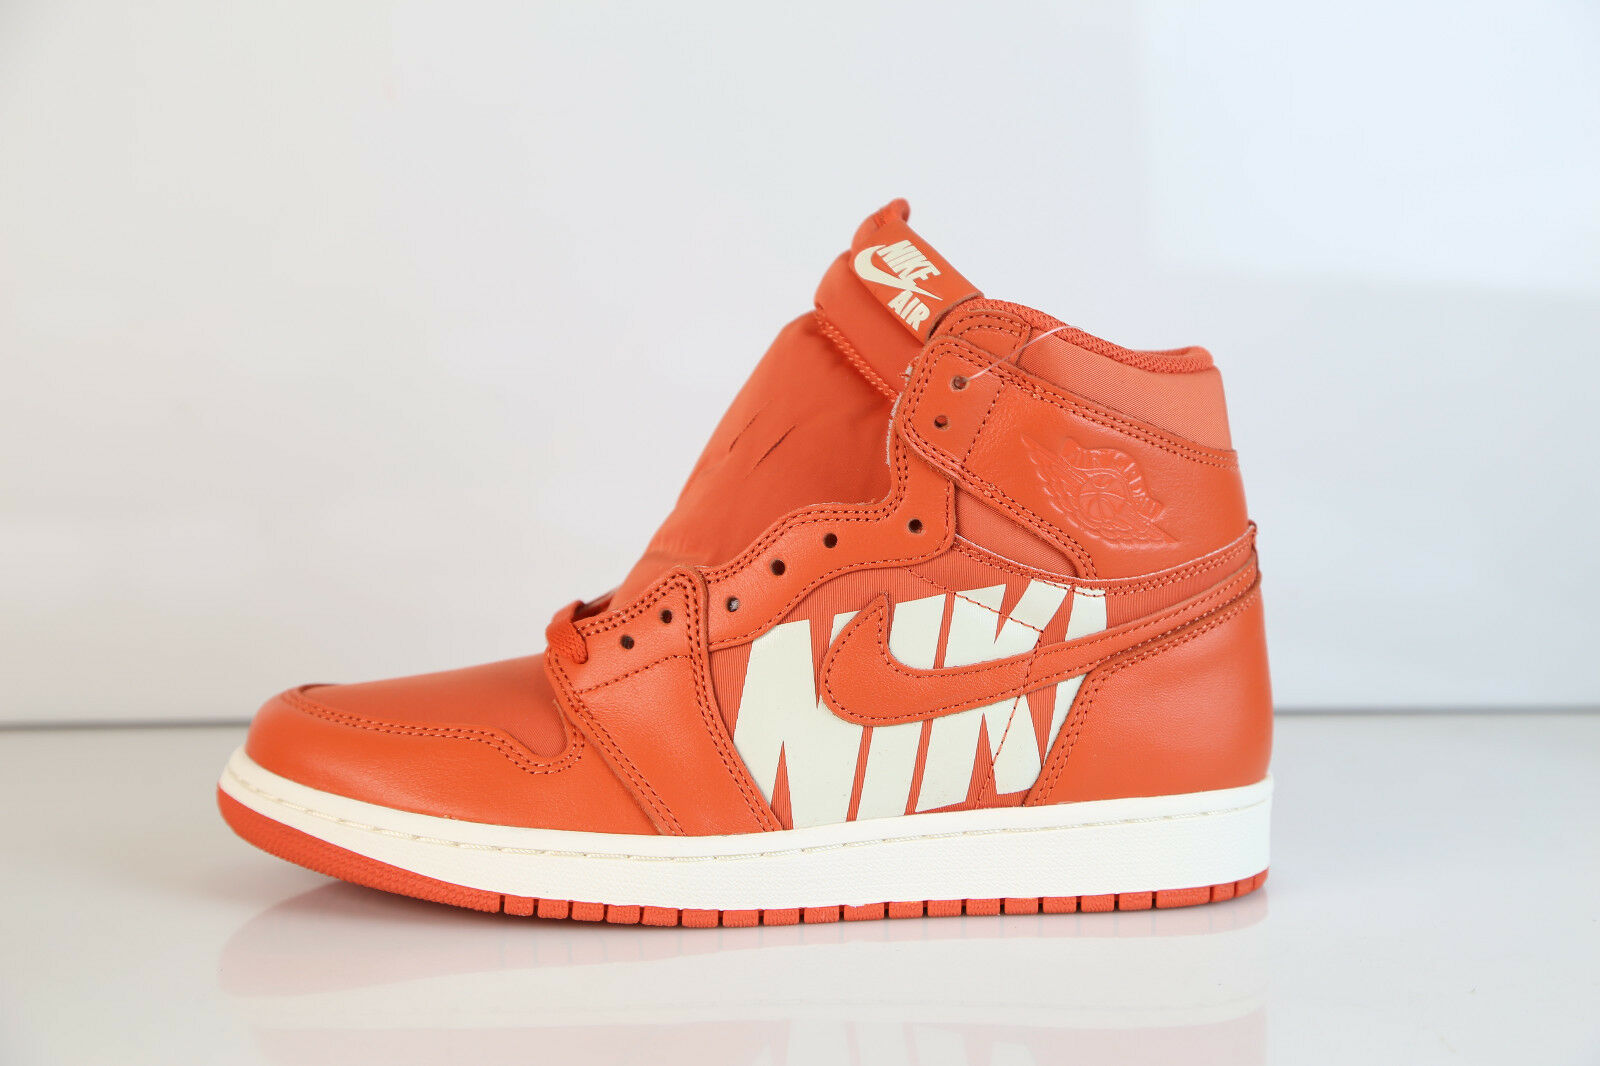 Nike Air Jordan Retro 1 High OG Vintage Coral Coral Coral Sail 555088-800 8-13 0db8b8